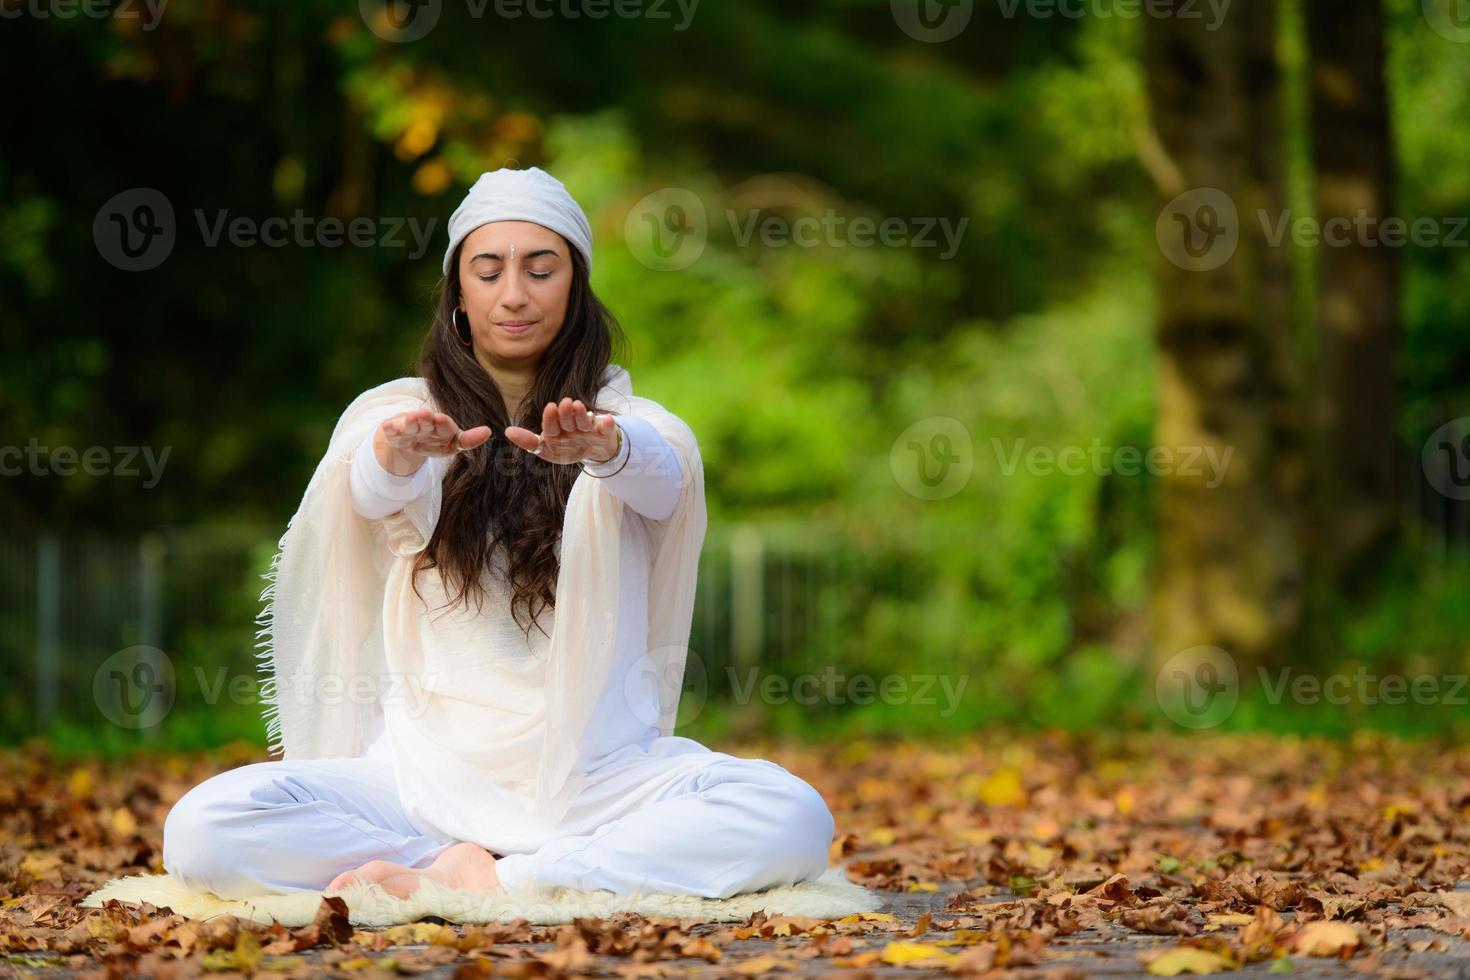 yoga-instructeur oefent oefeningen foto